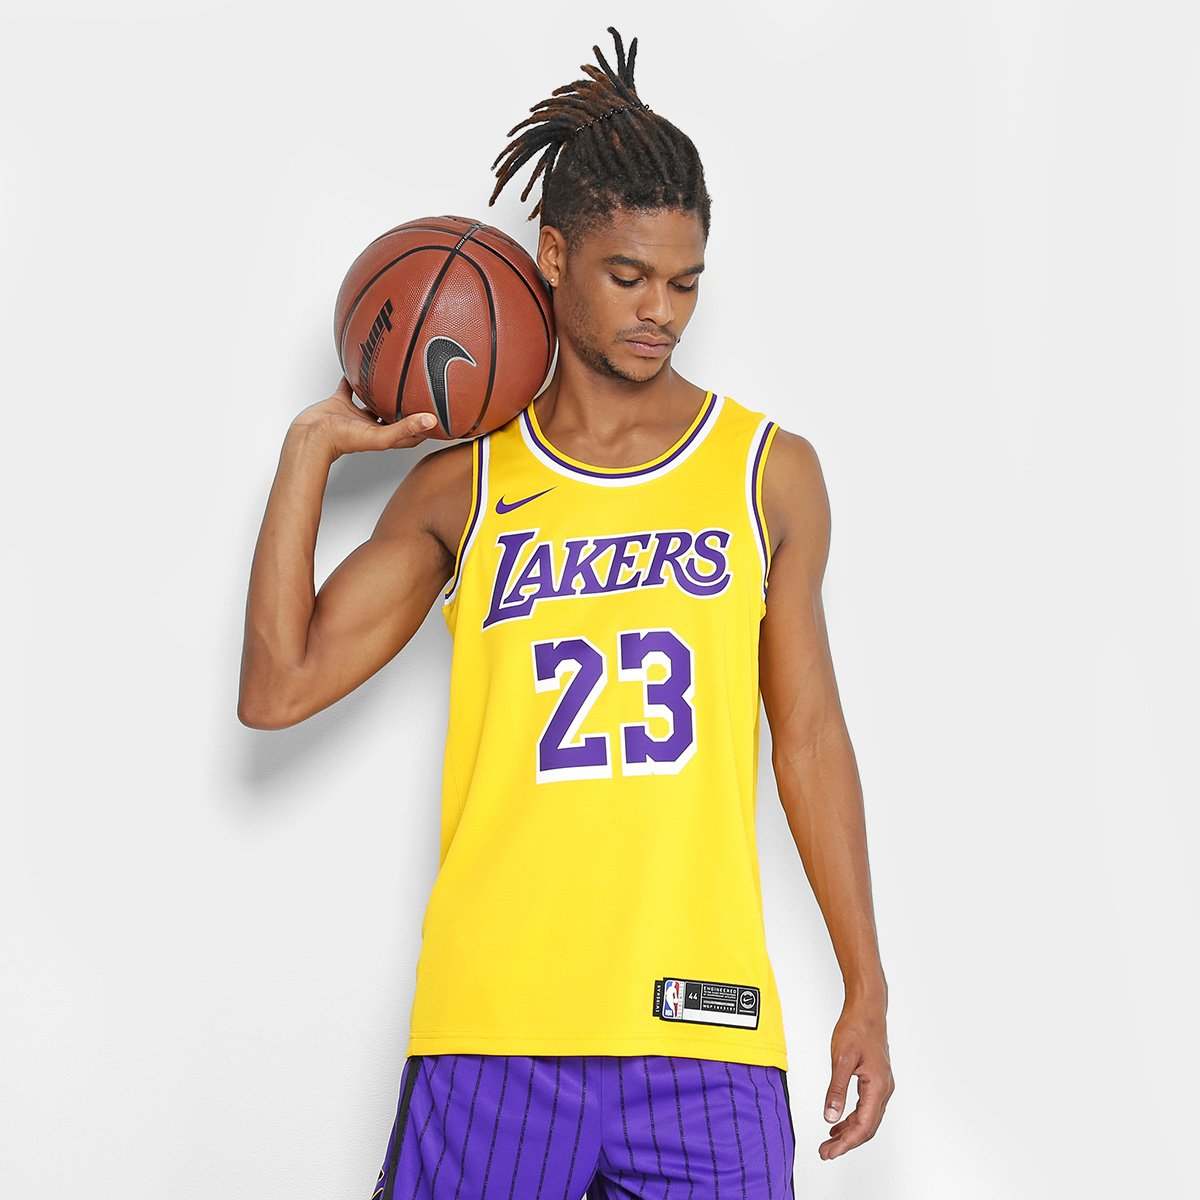 217dab8aa Regata Swingman NBA Los Angeles Lakers LeBron James Jersey Nike - Amarelo -  Compre Agora